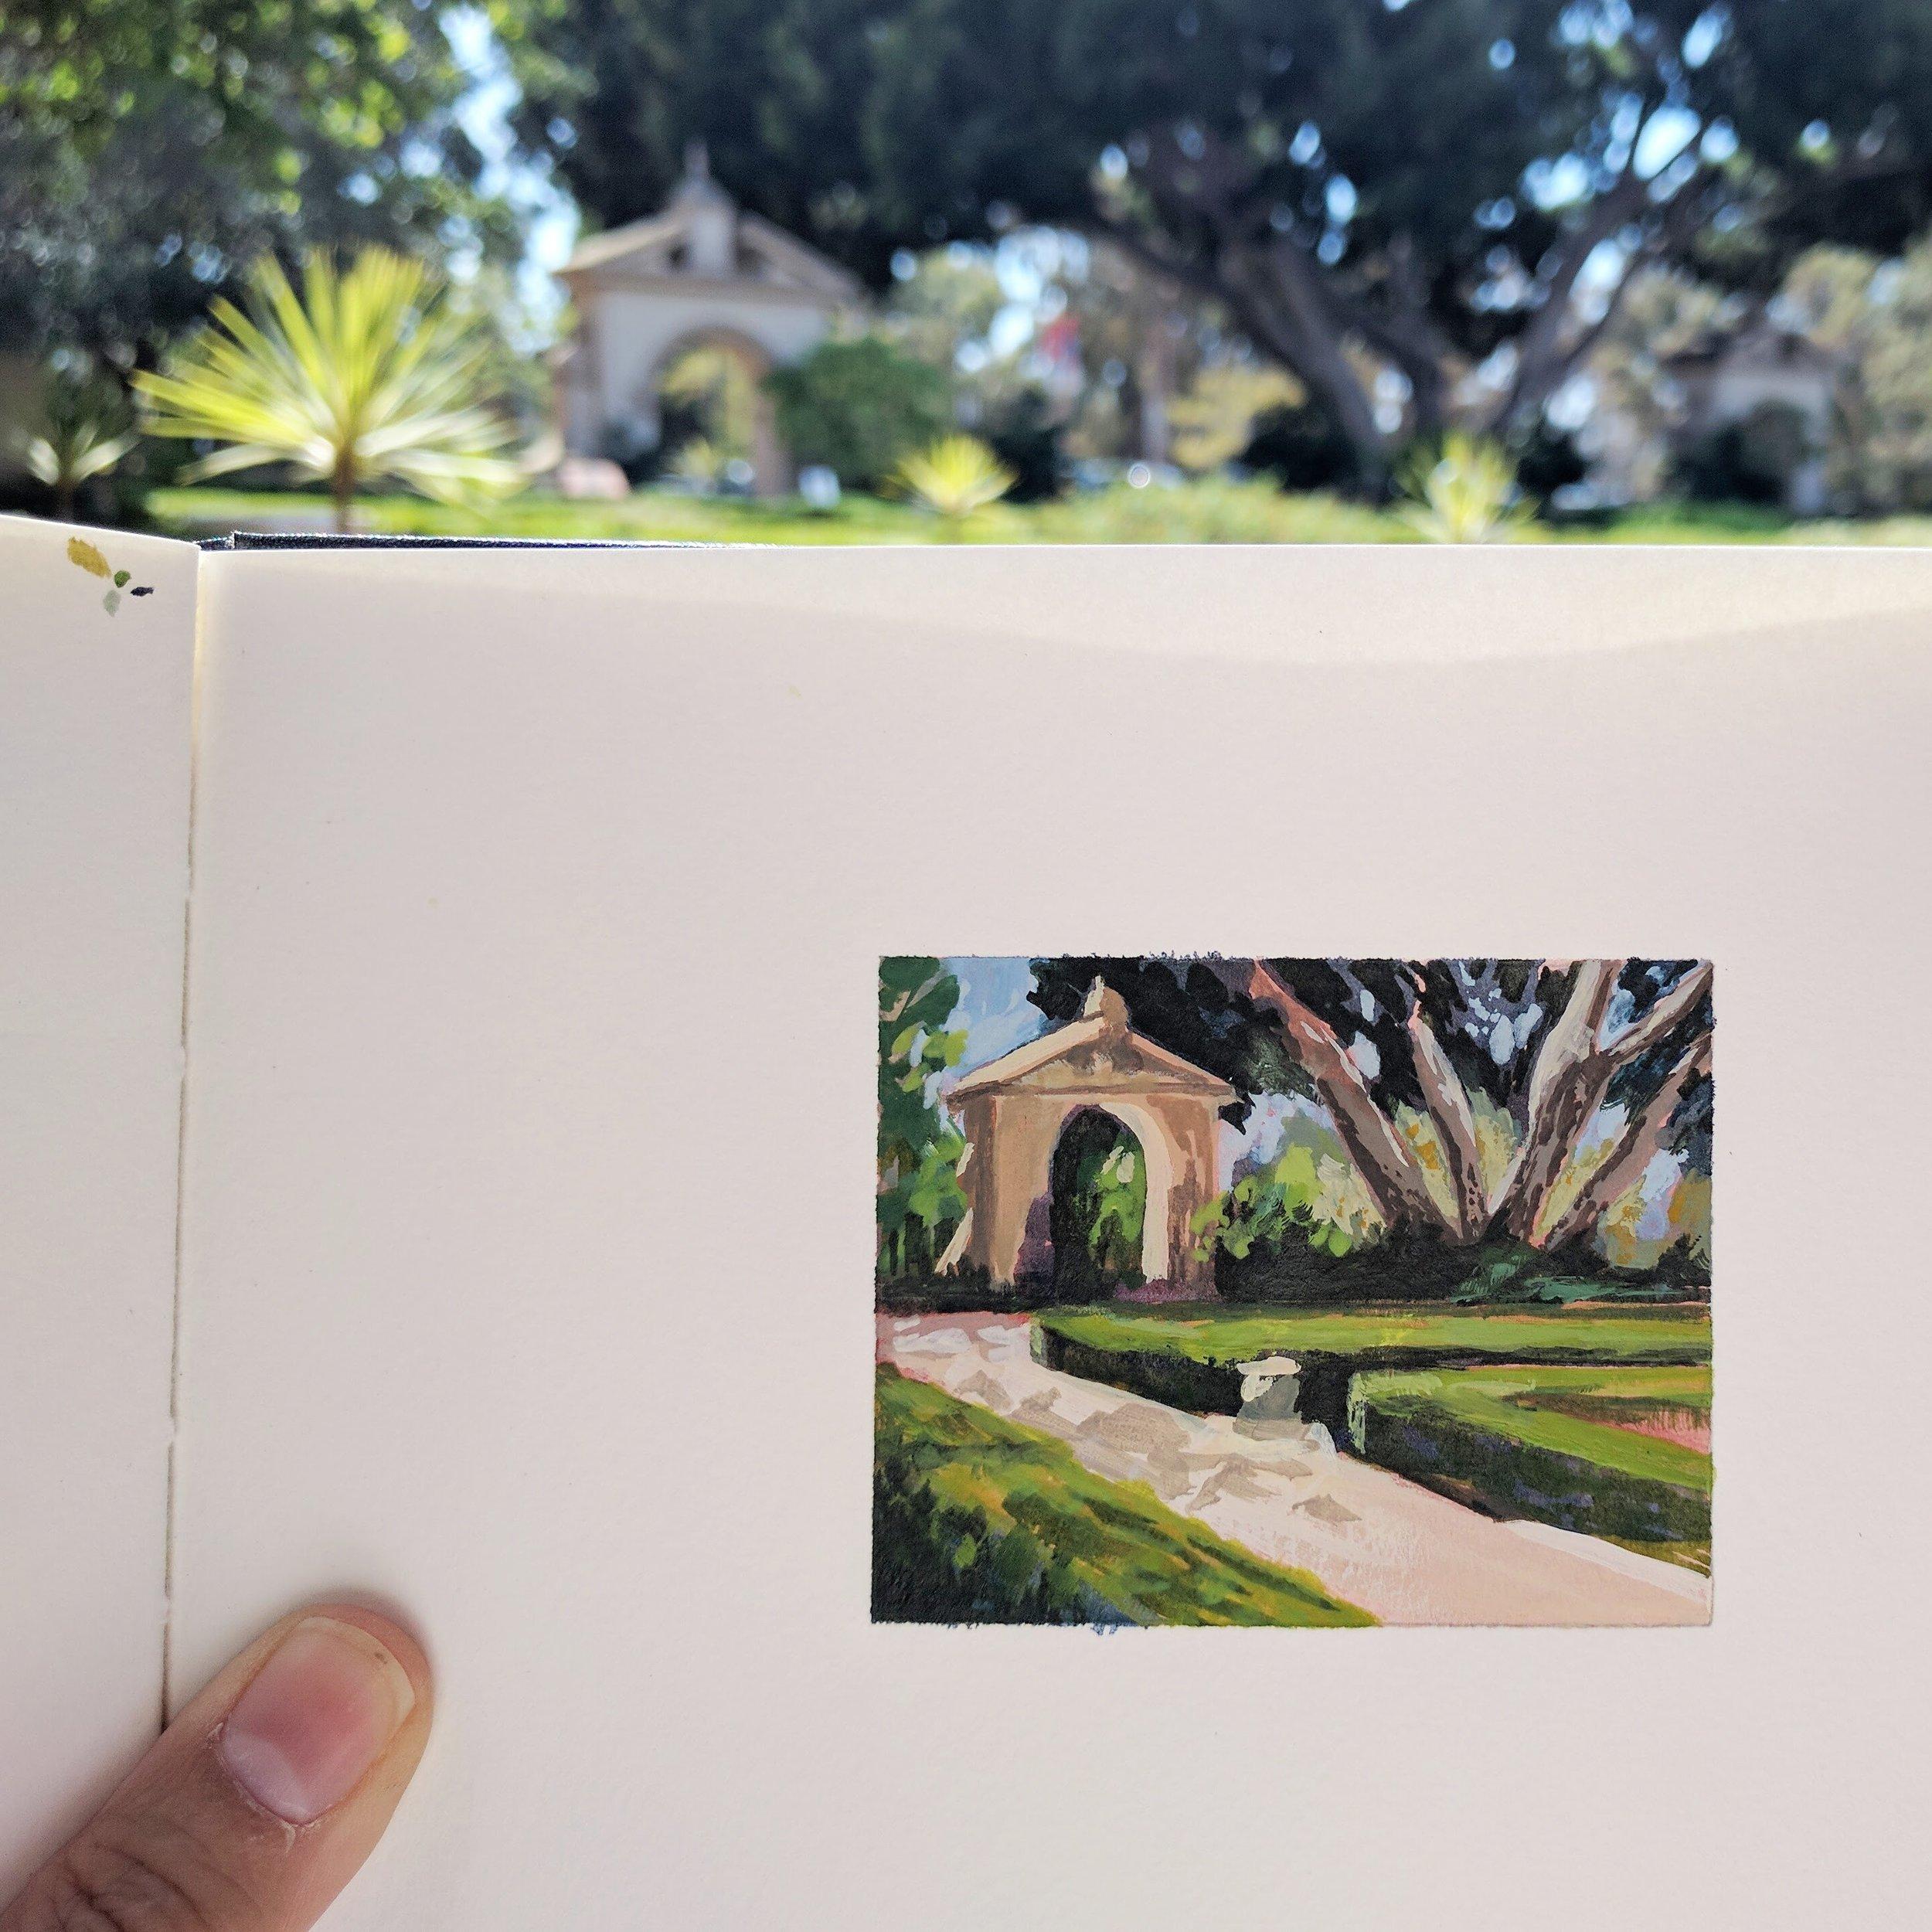 My Small Paintings miniature tiny art plein air watercolour painting of secret walled summer garden in Balboa Park San Diego California